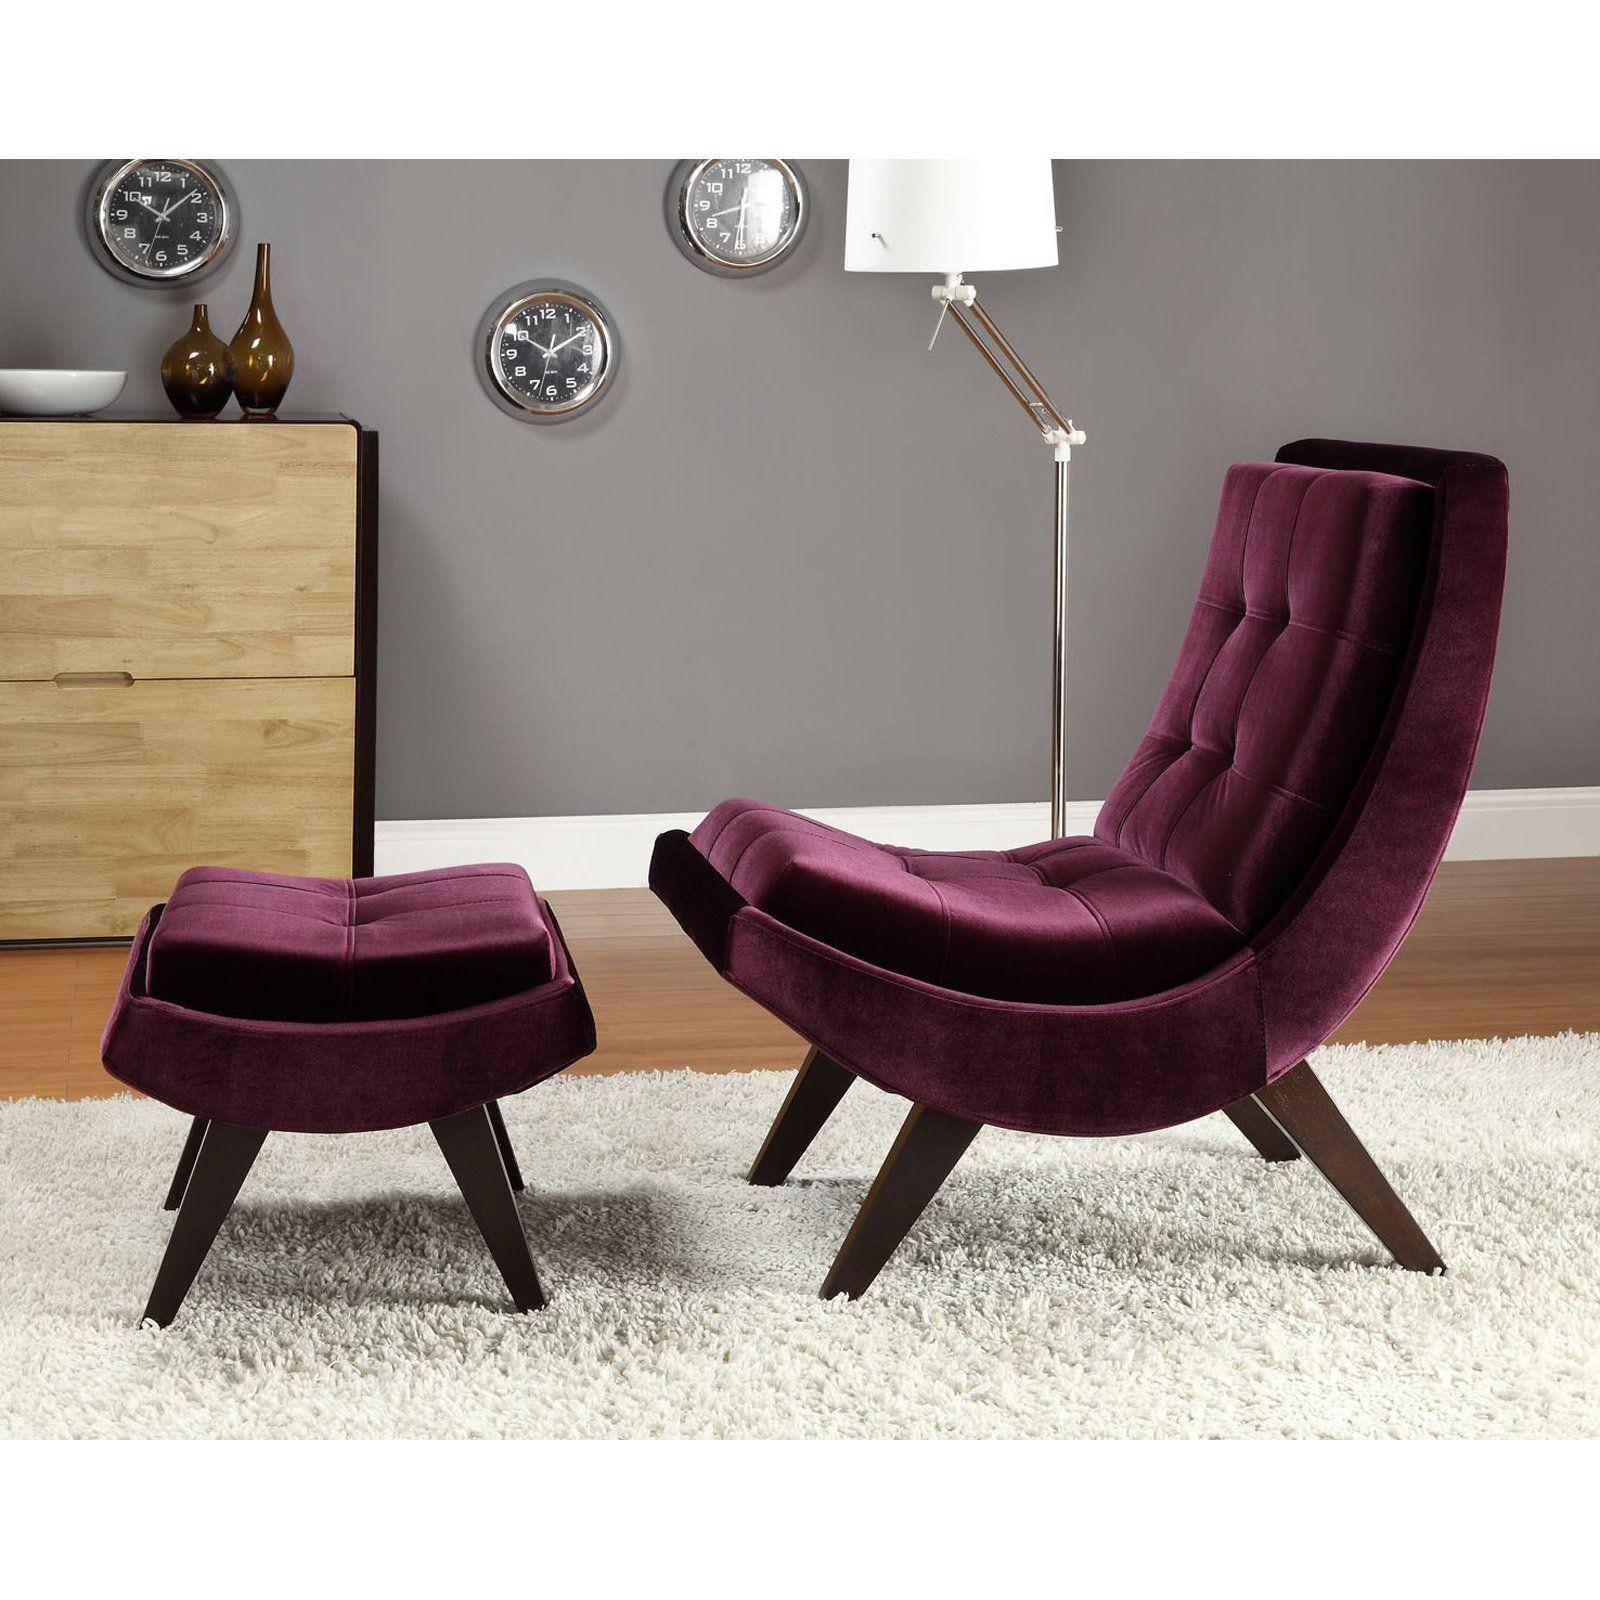 modern chairs for living room%0A Chelsea Lane Lashay Velvet Lounge Chair  u     Ottoman  Purple  HN   S   S  A